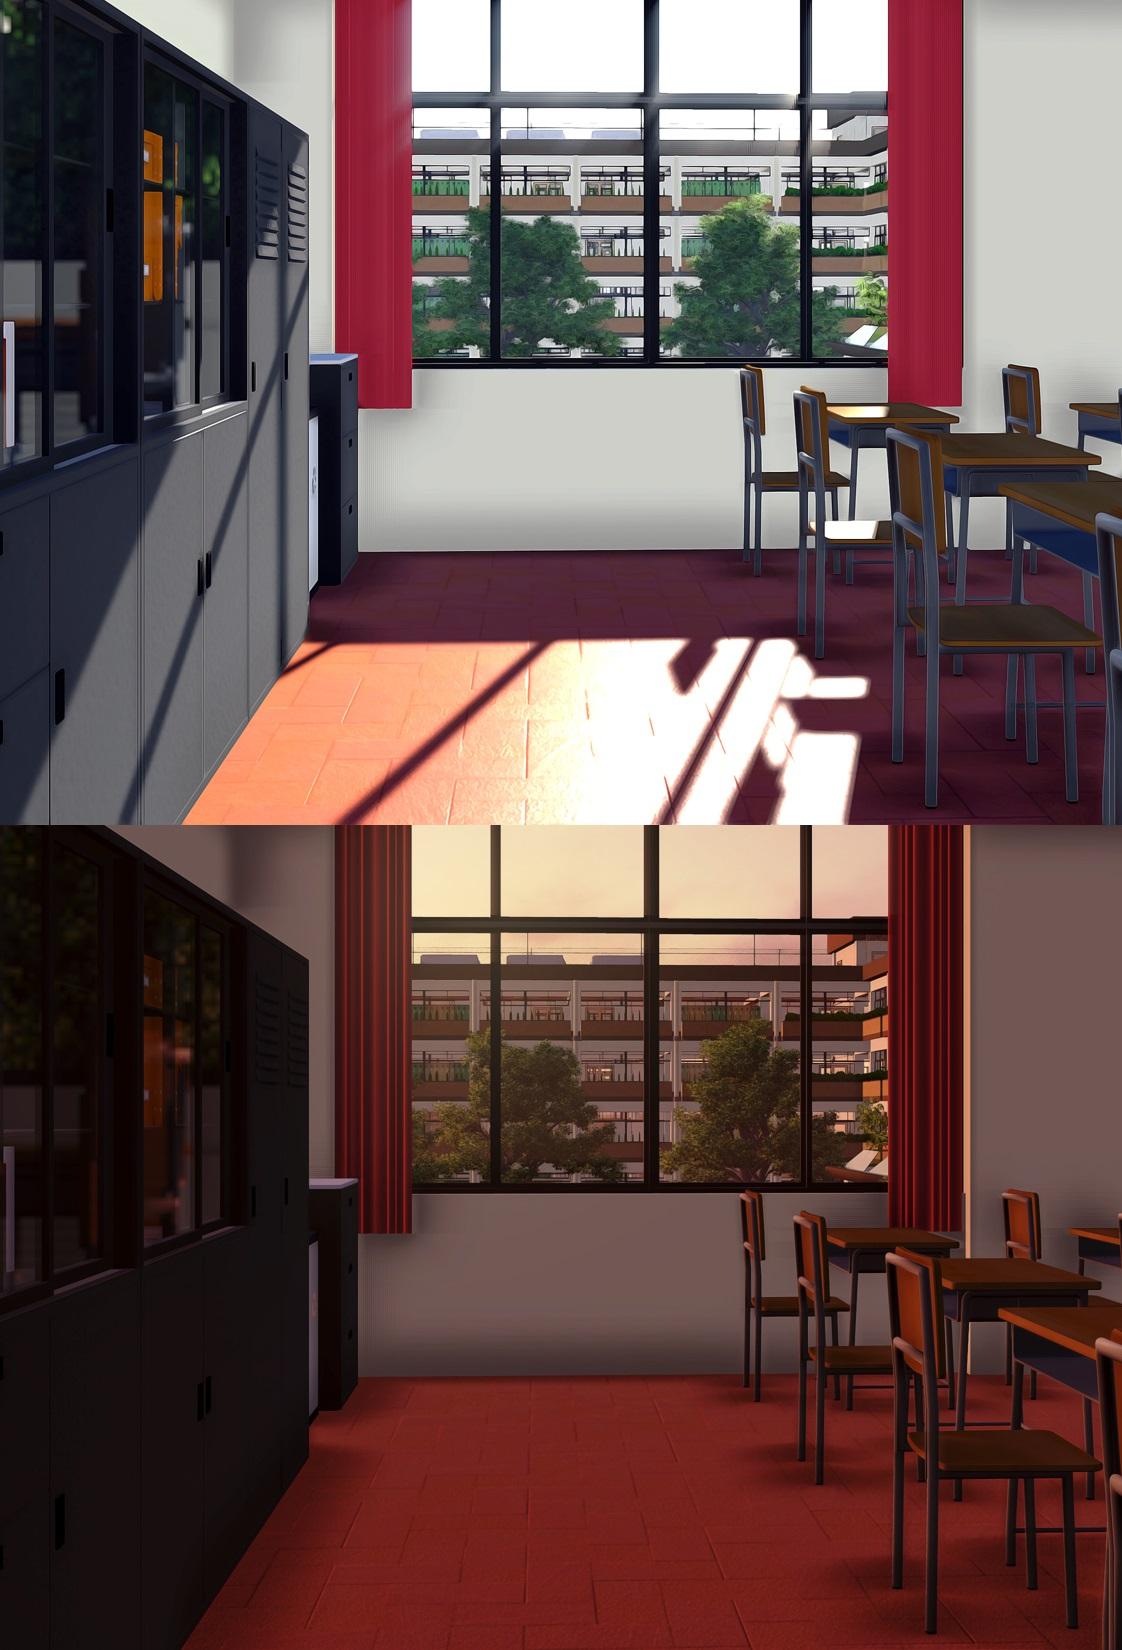 2HD Background - Classroom 01.jpg